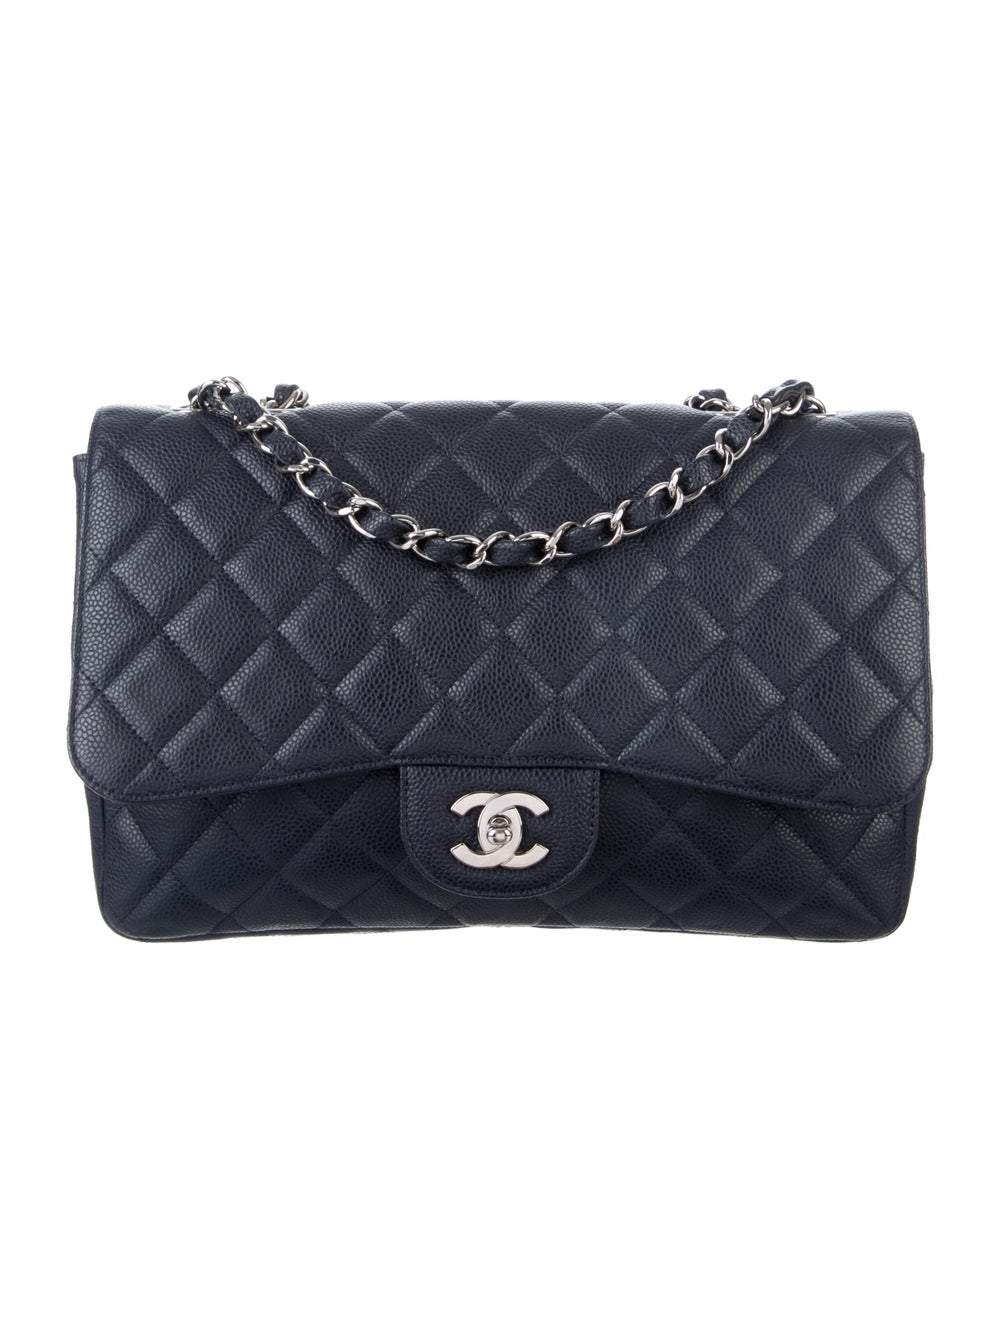 Chanel Jumbo Single Flap Bag Blue - image 1